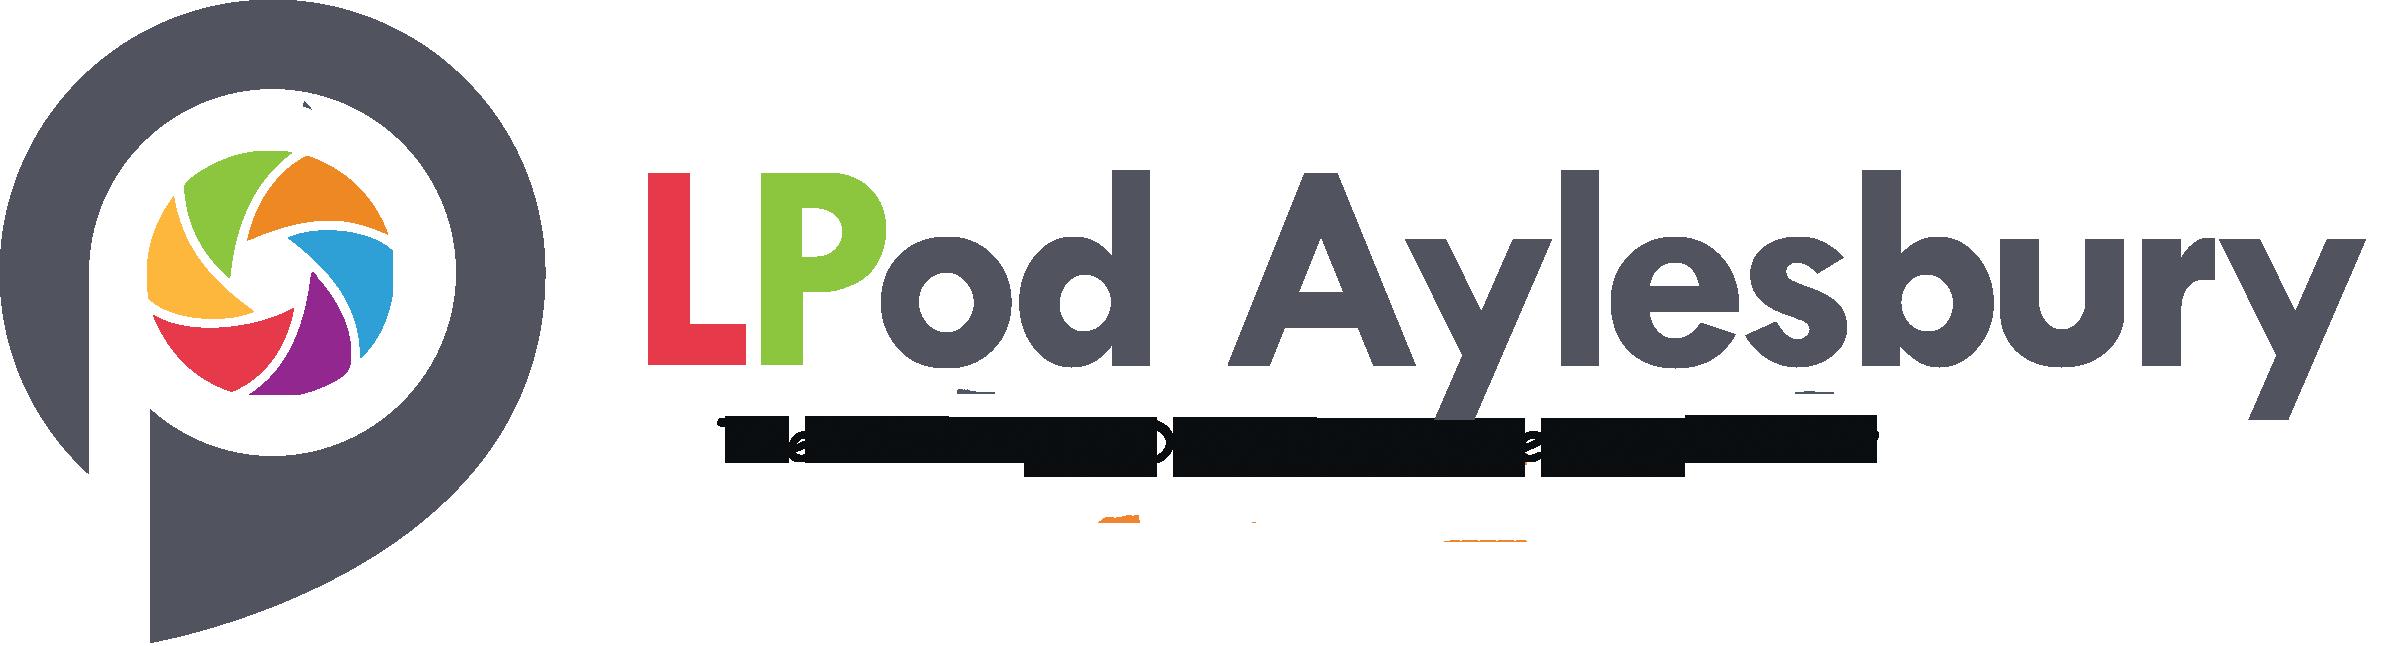 intensive driving courses aylesbury, intensive driving lessons aylesbury, intensive driving lessons aylesbury